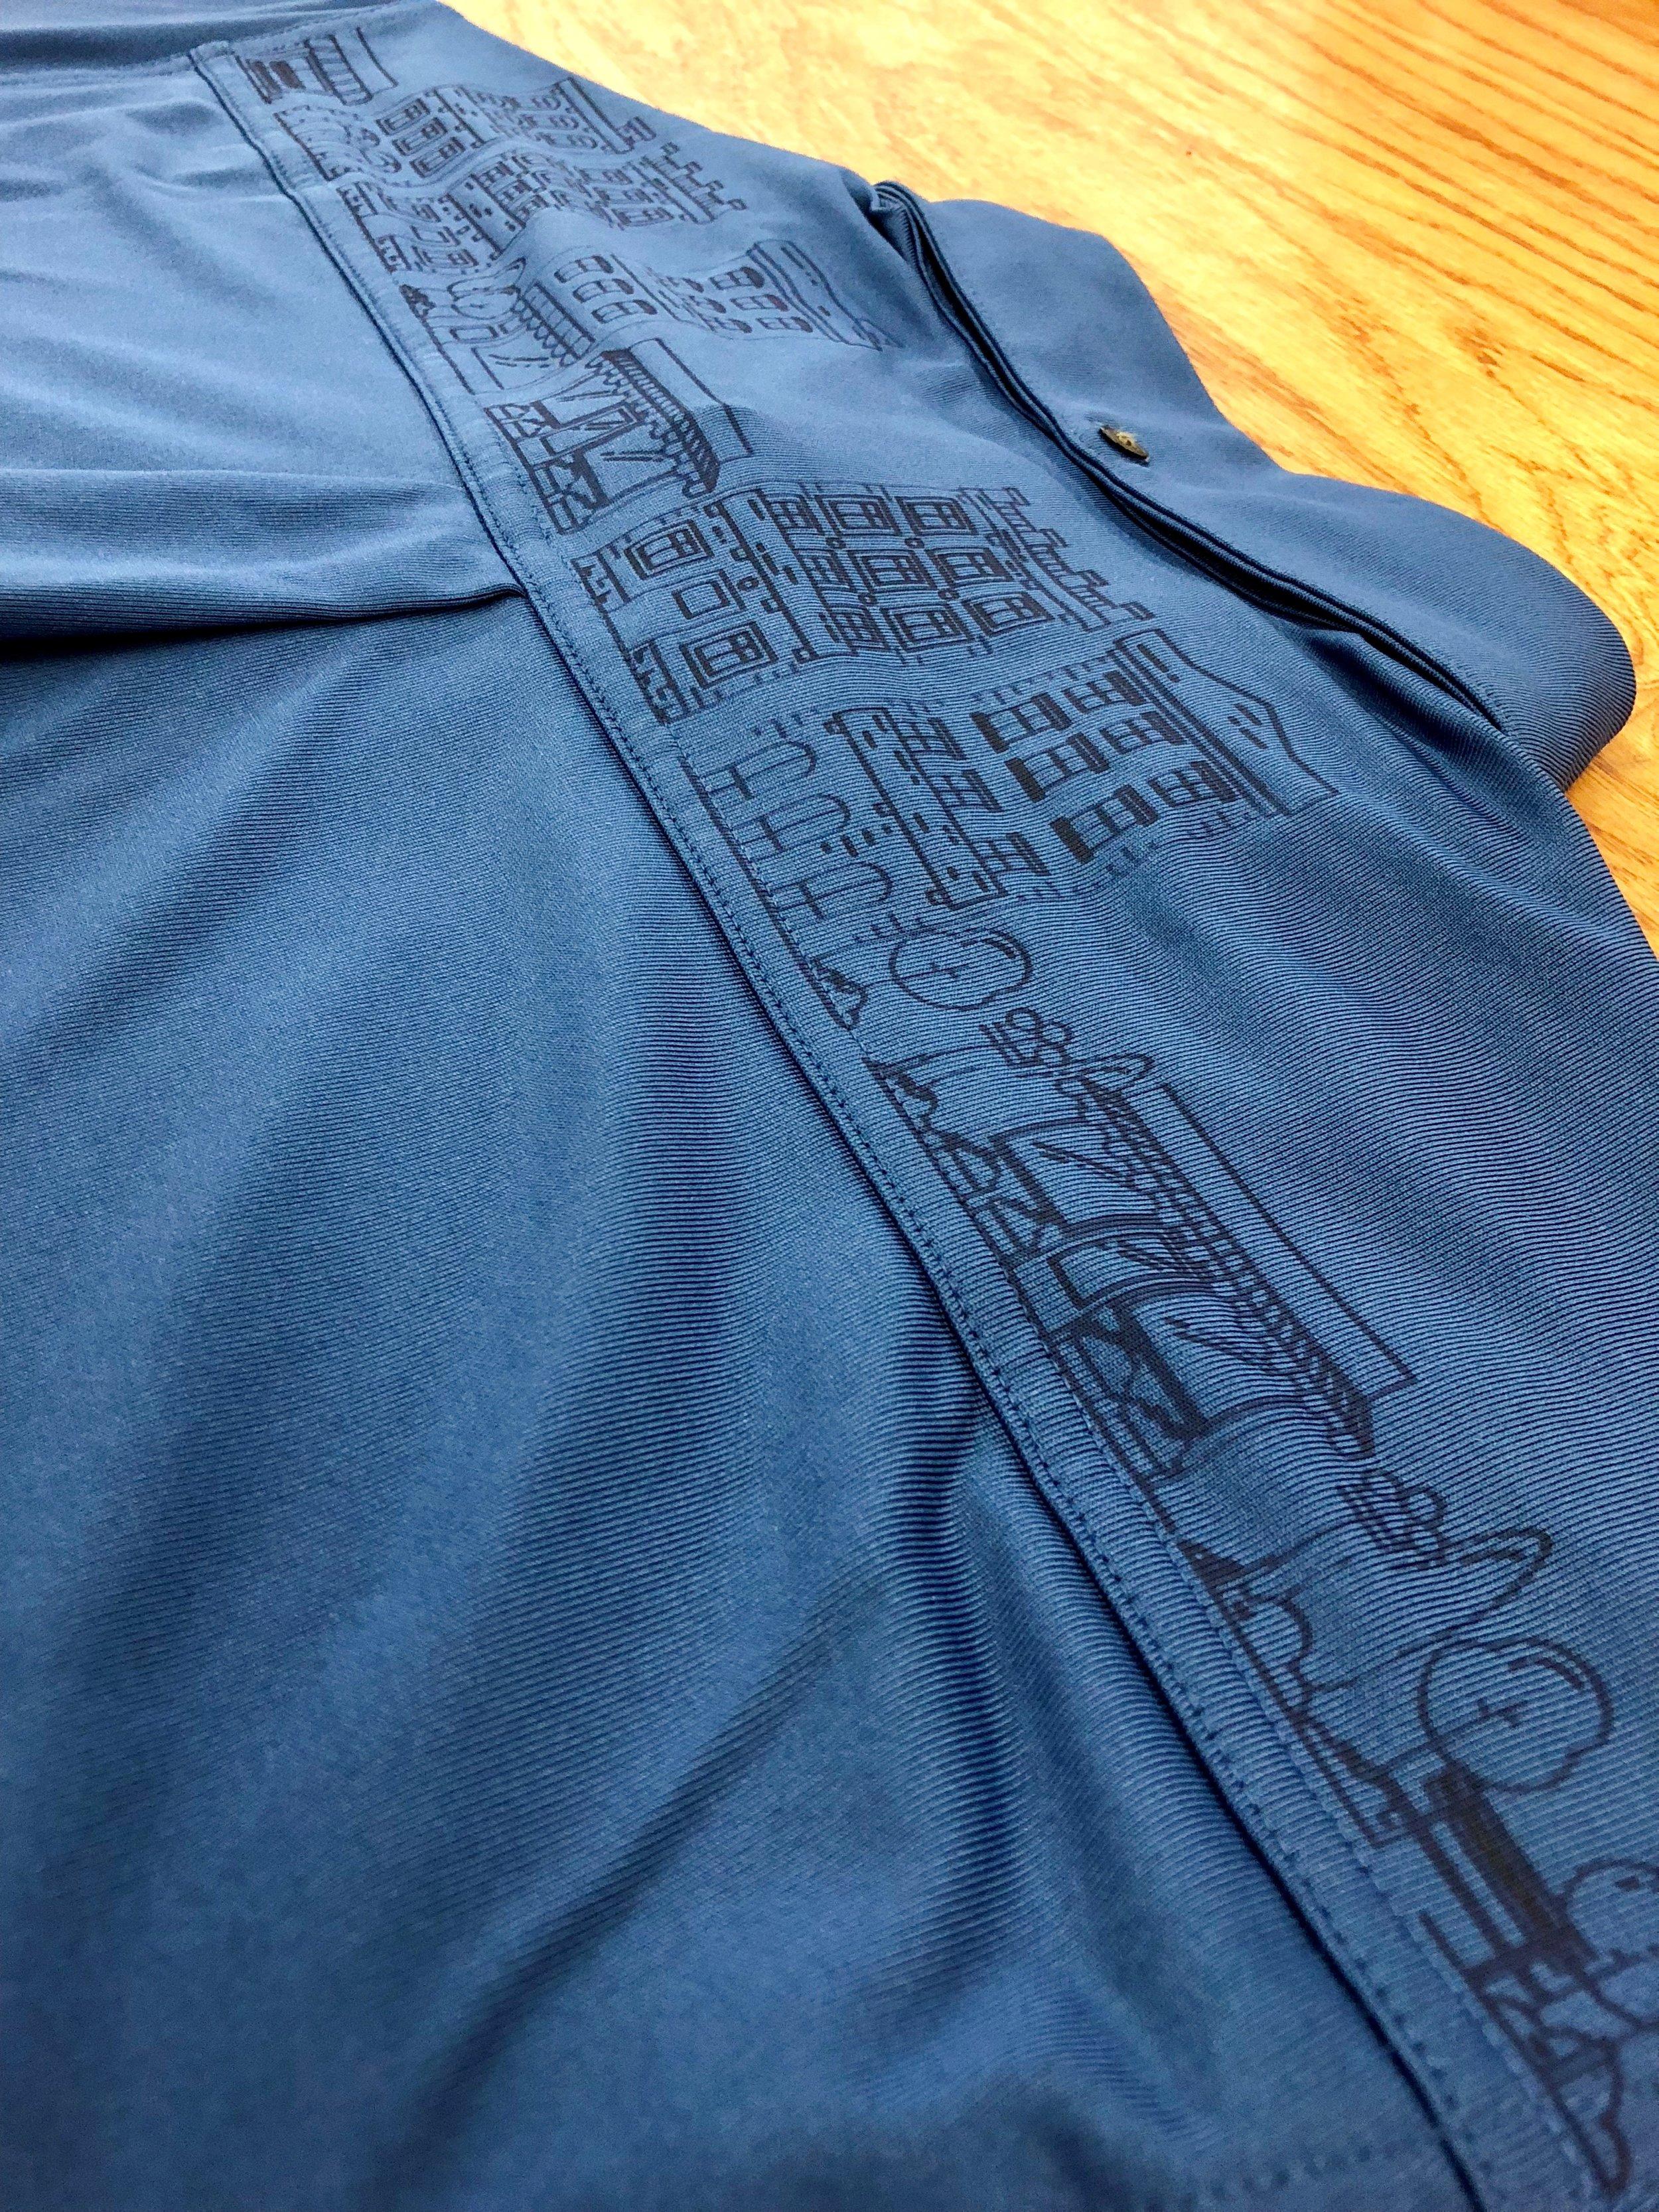 logounltd_laser_etching_embroidery_screen_printing_apparel_uniform_custom_tshirts_dye_sublimation_kirkland_bellevue_seattle_redmond_branded_merchandise_promotional_products_logo_unltd_amazon_aws_tshirt_patches_amventure_amt.jpg